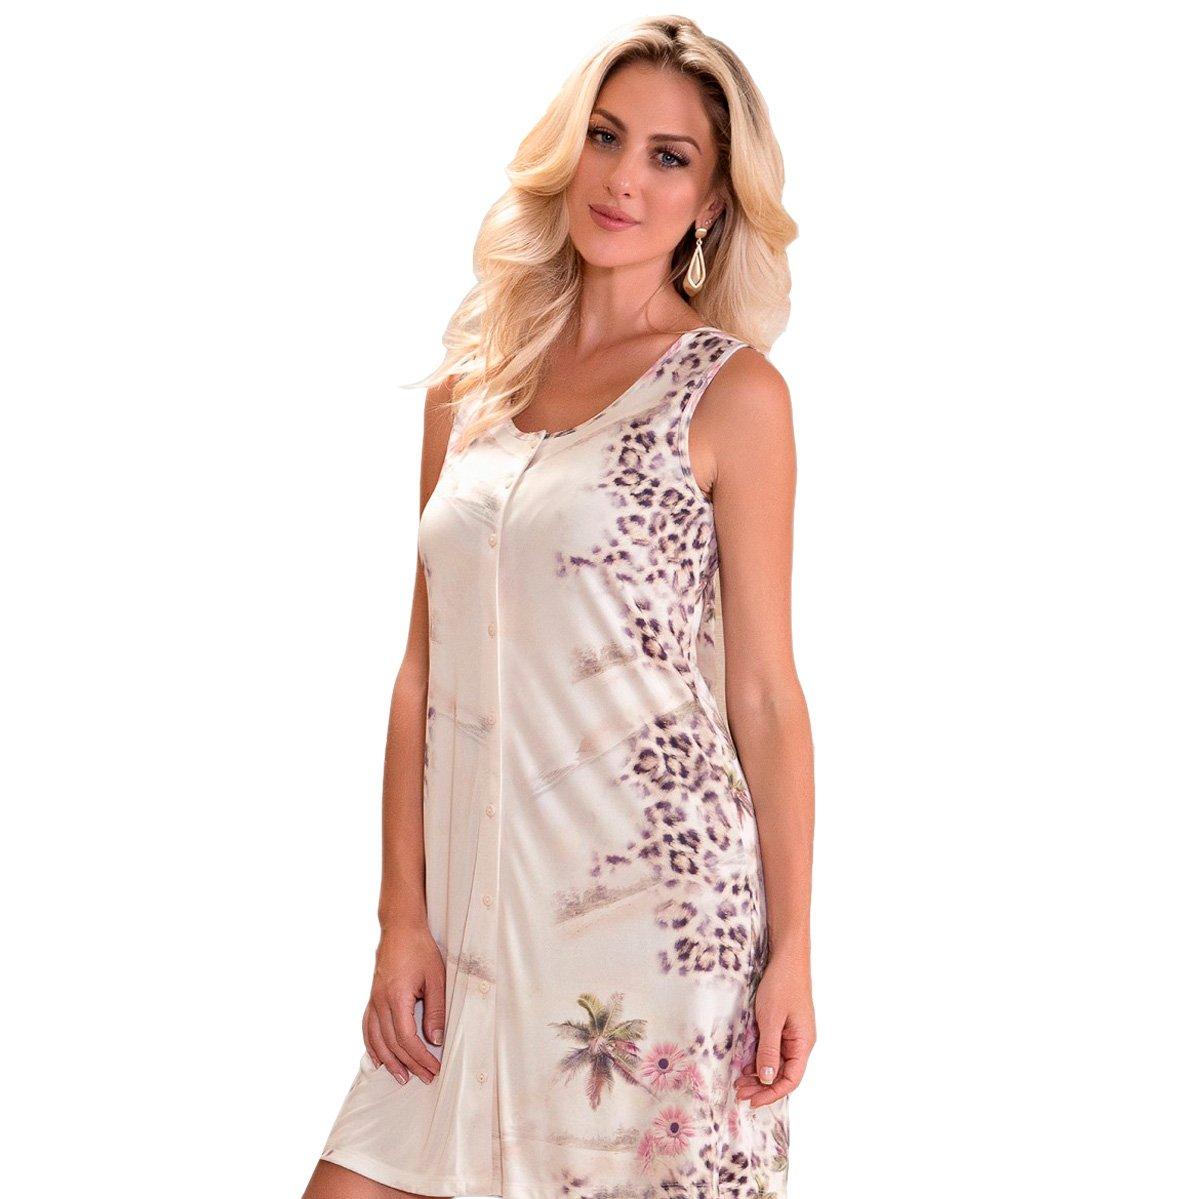 Bizz Store - Camisola Feminina Recco Regata Aberta Colorida af234826532